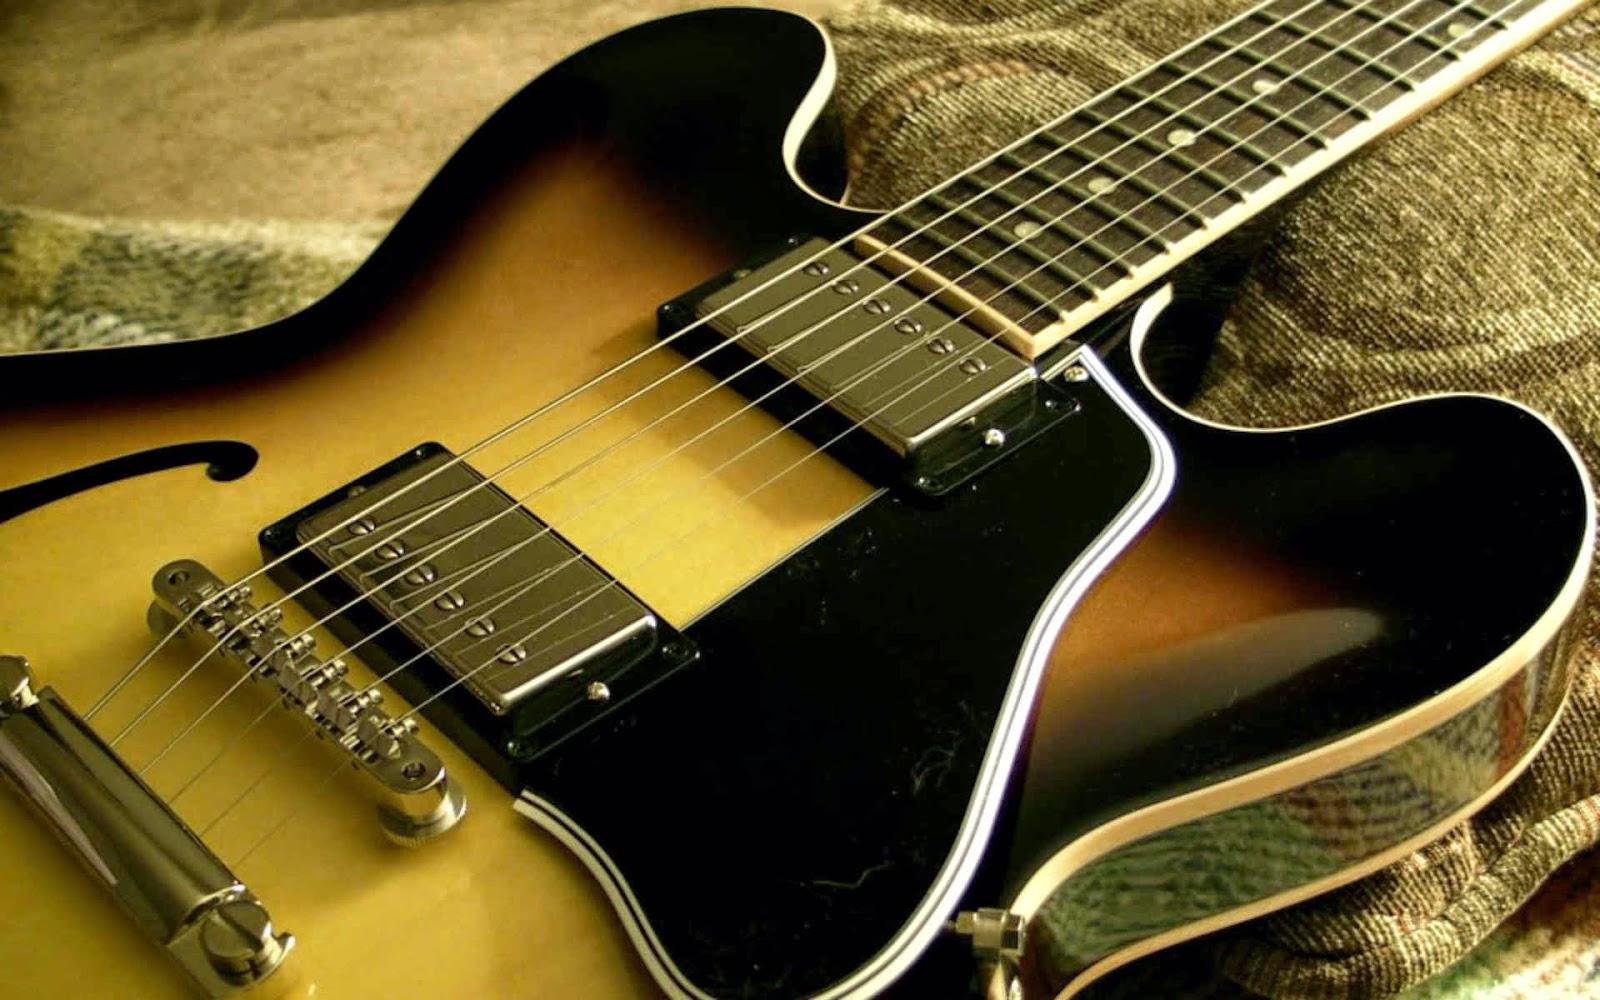 Gibson guitar wallpaper hd wallpapersafari gibson acoustic guitar wallpaper hd 1920x1200 download wallpaper for voltagebd Gallery